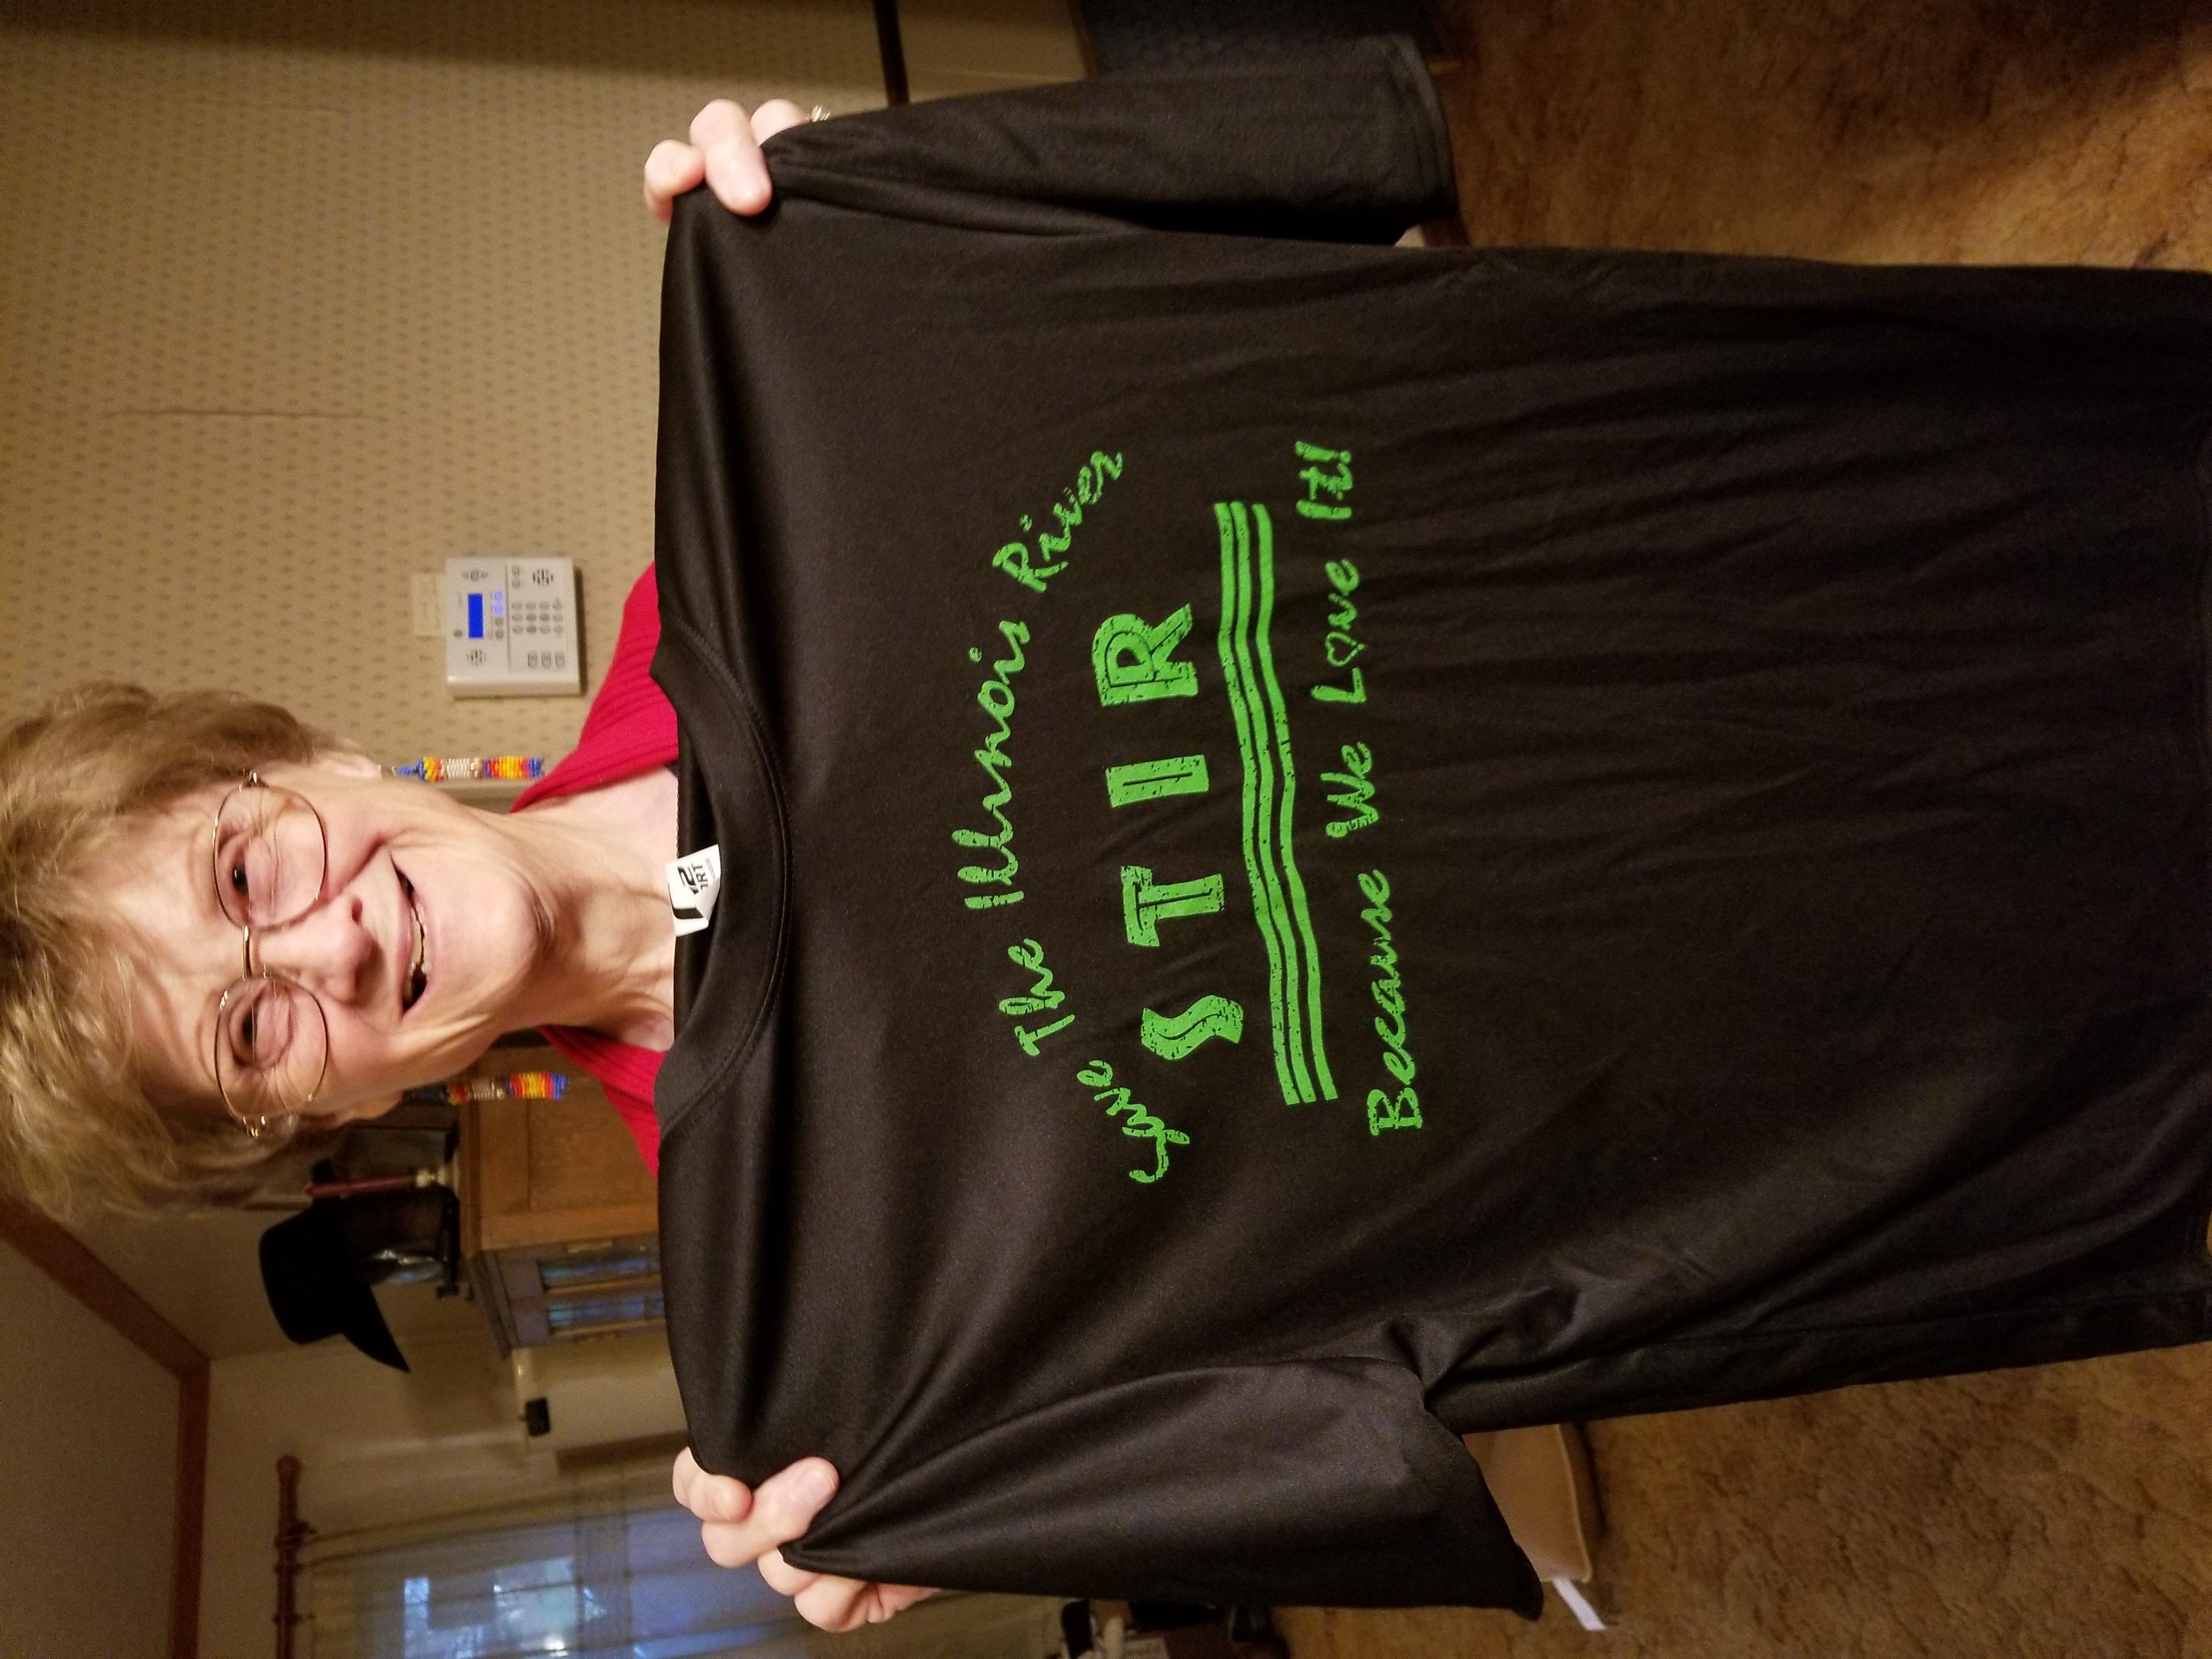 STiR t-shirt 2 Dec 2020 3